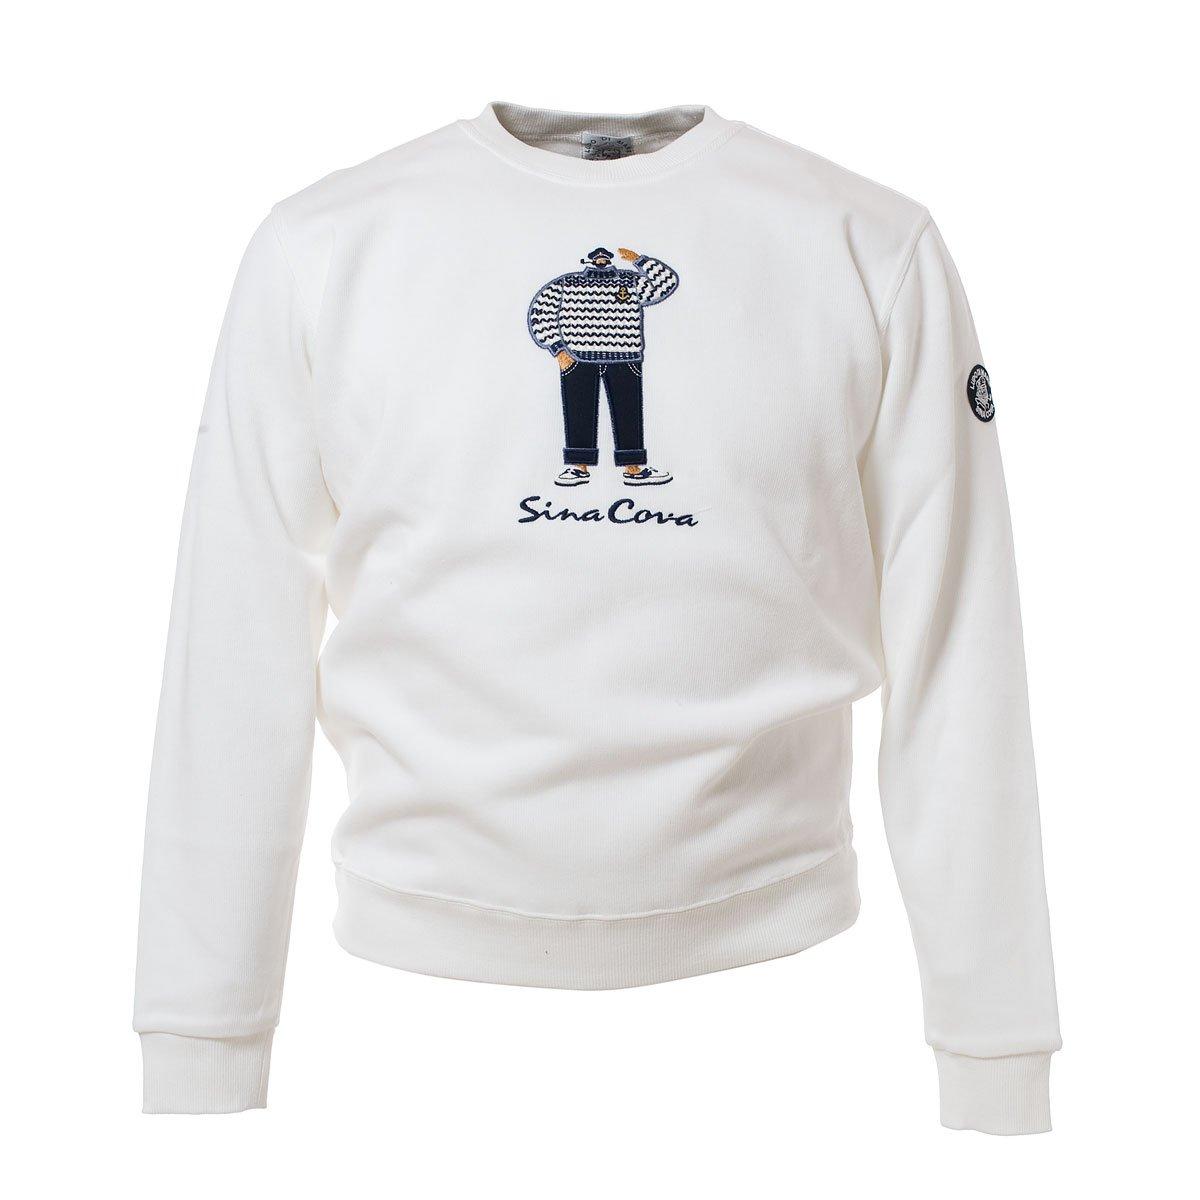 SINACOVA Men's sweatshirt Off-White Large by SINA COVA